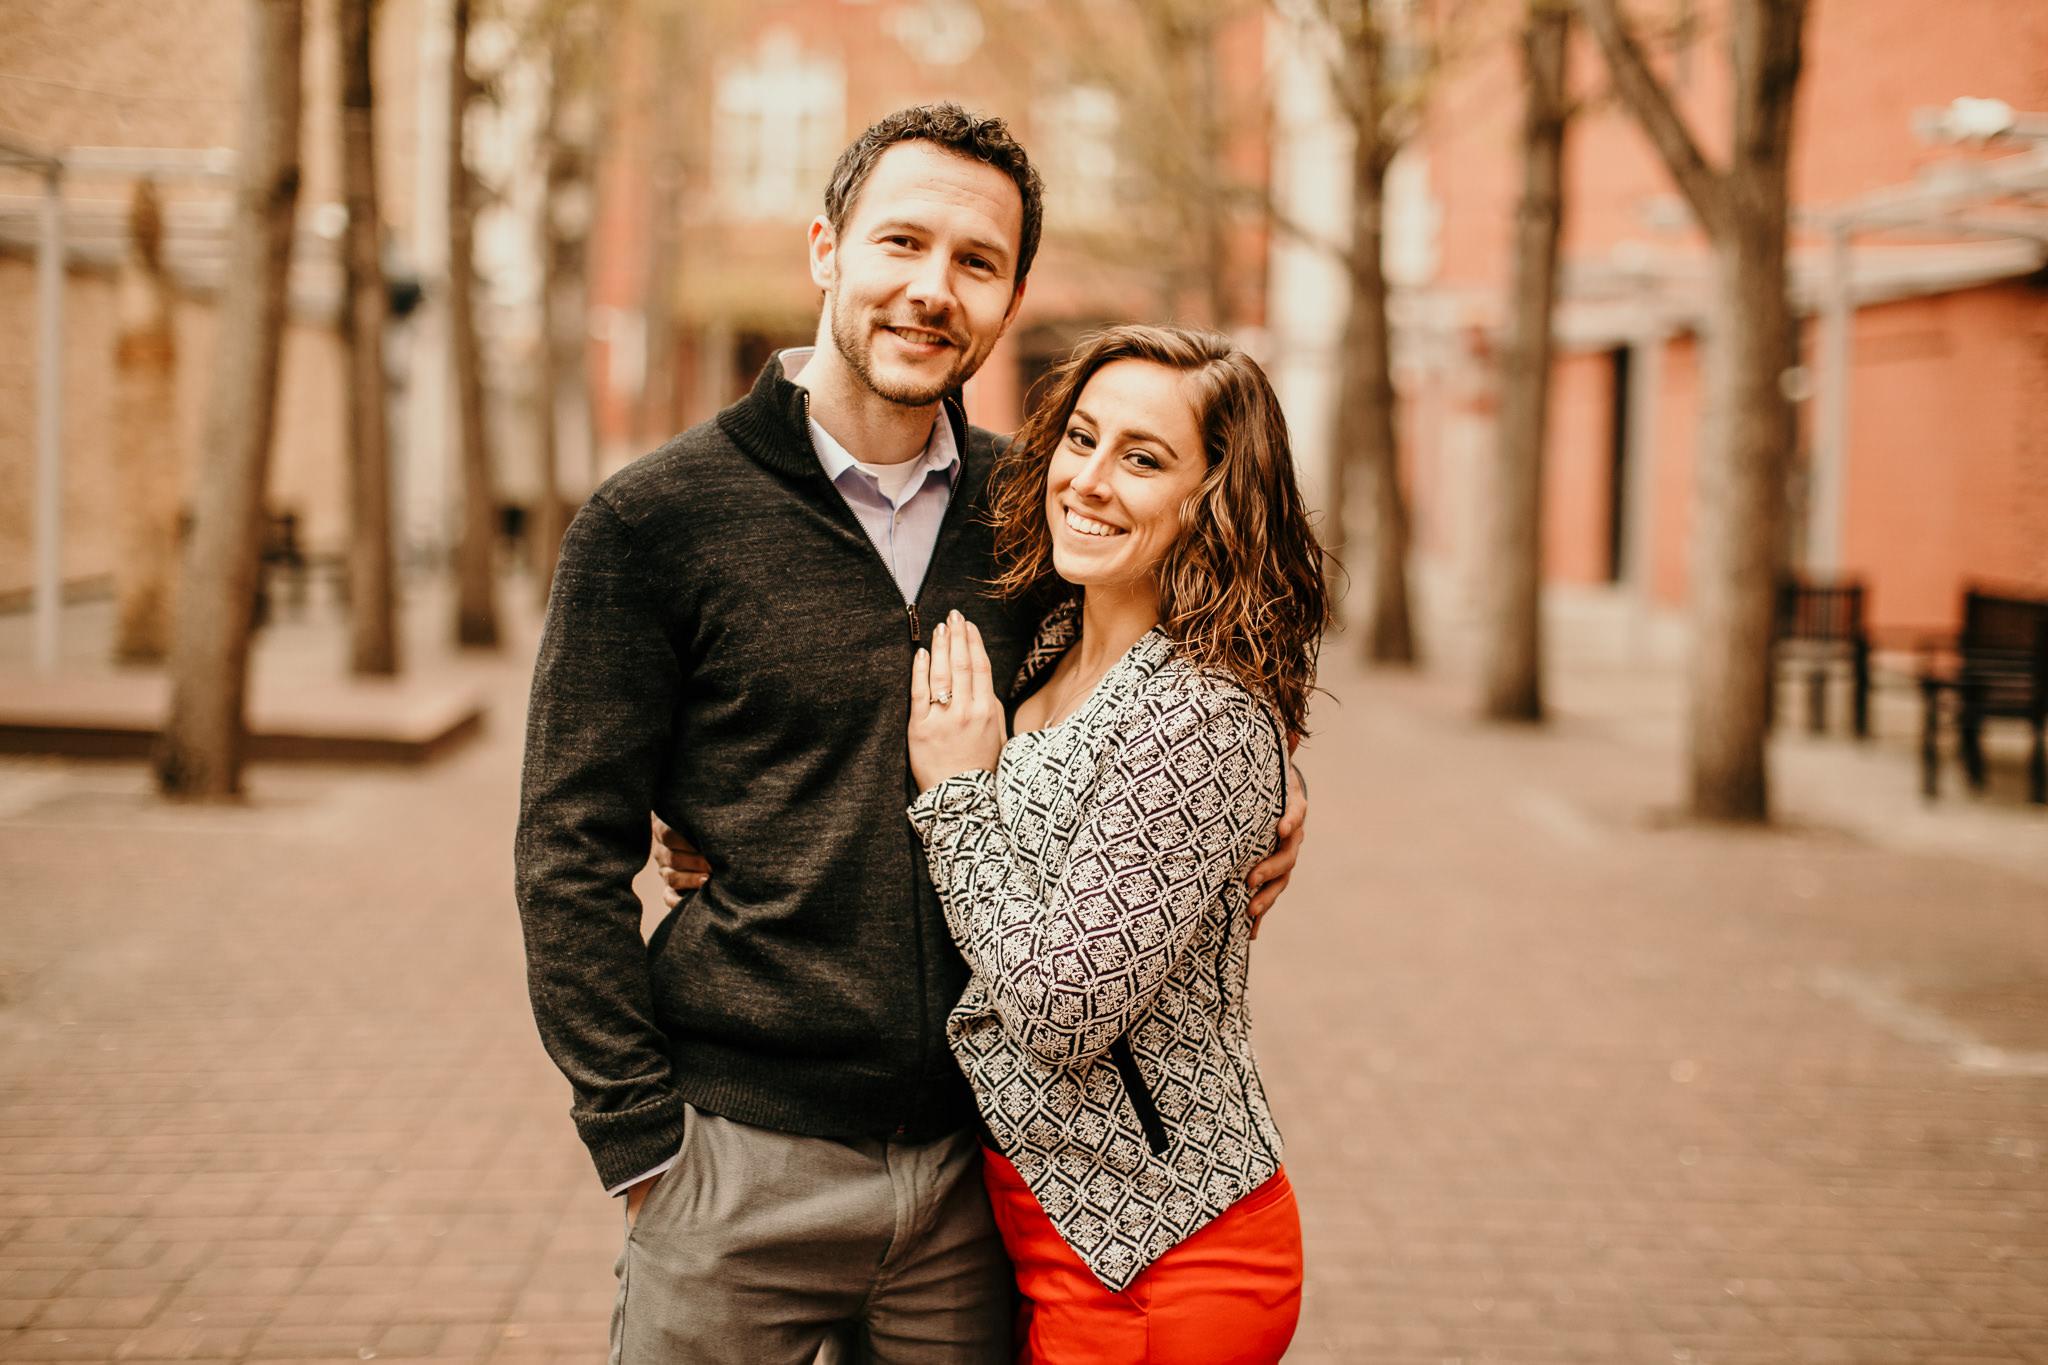 Engagement - Downtown Roanoke - Virginia - Wedding Photographer - Pat Cori Photography-40.jpg